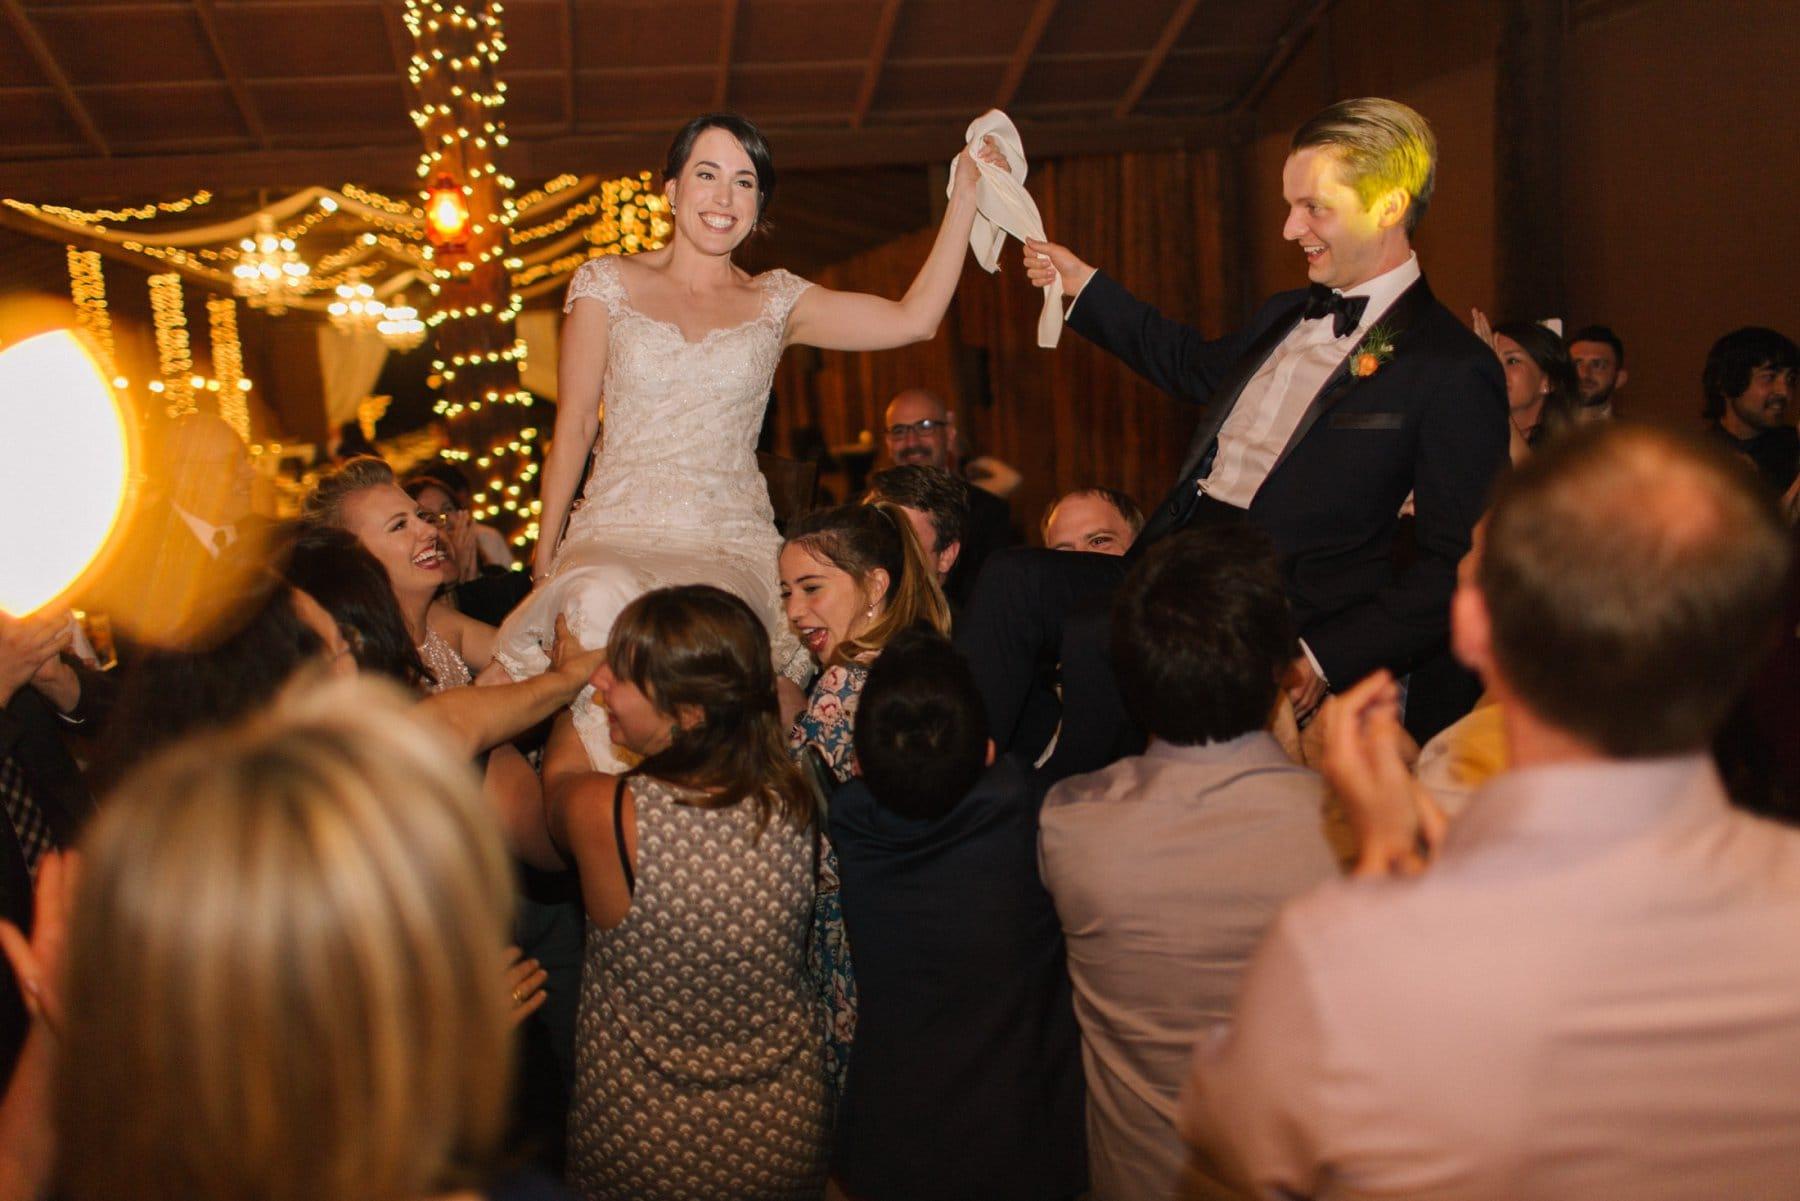 wedding horah at Desert Foothills barn elegant Jewish wedding